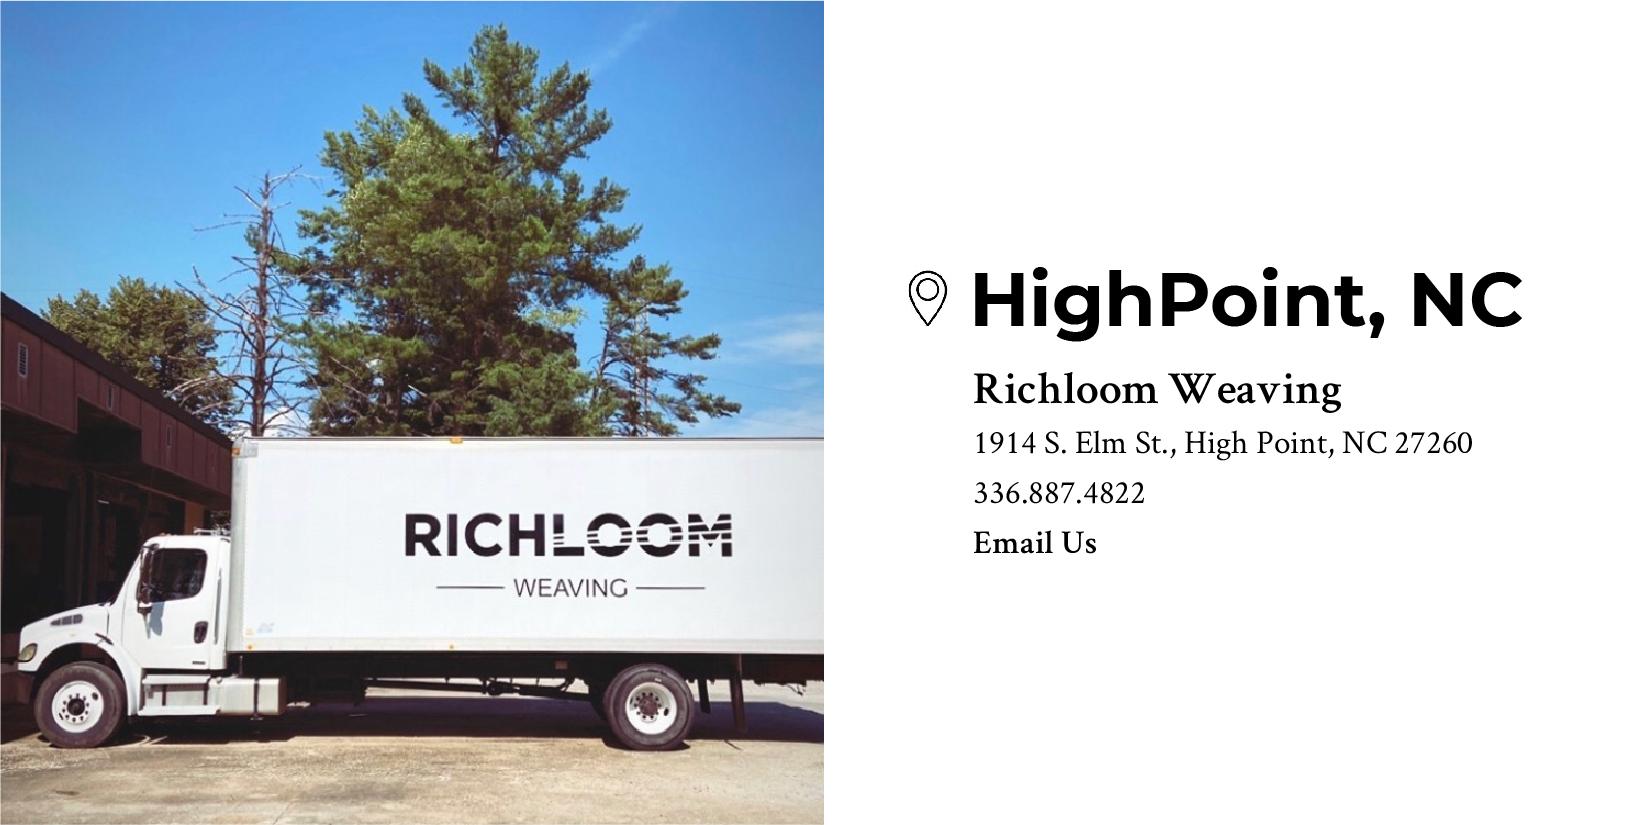 Richloom Weaving